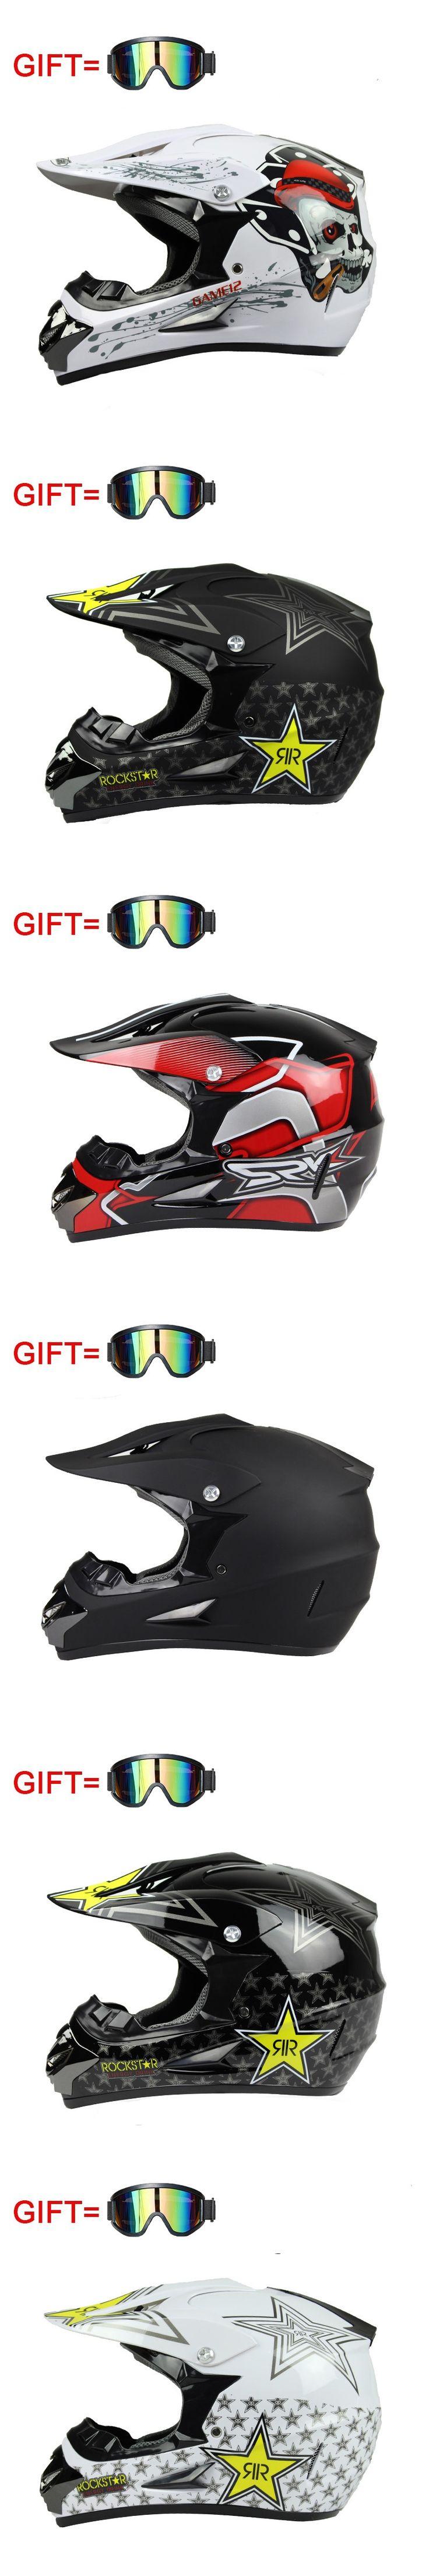 Rockstar motorcycle helmet ATV Dirt bike downhill cross capacete da motocicleta cascos motocross off road helmets WLT-125